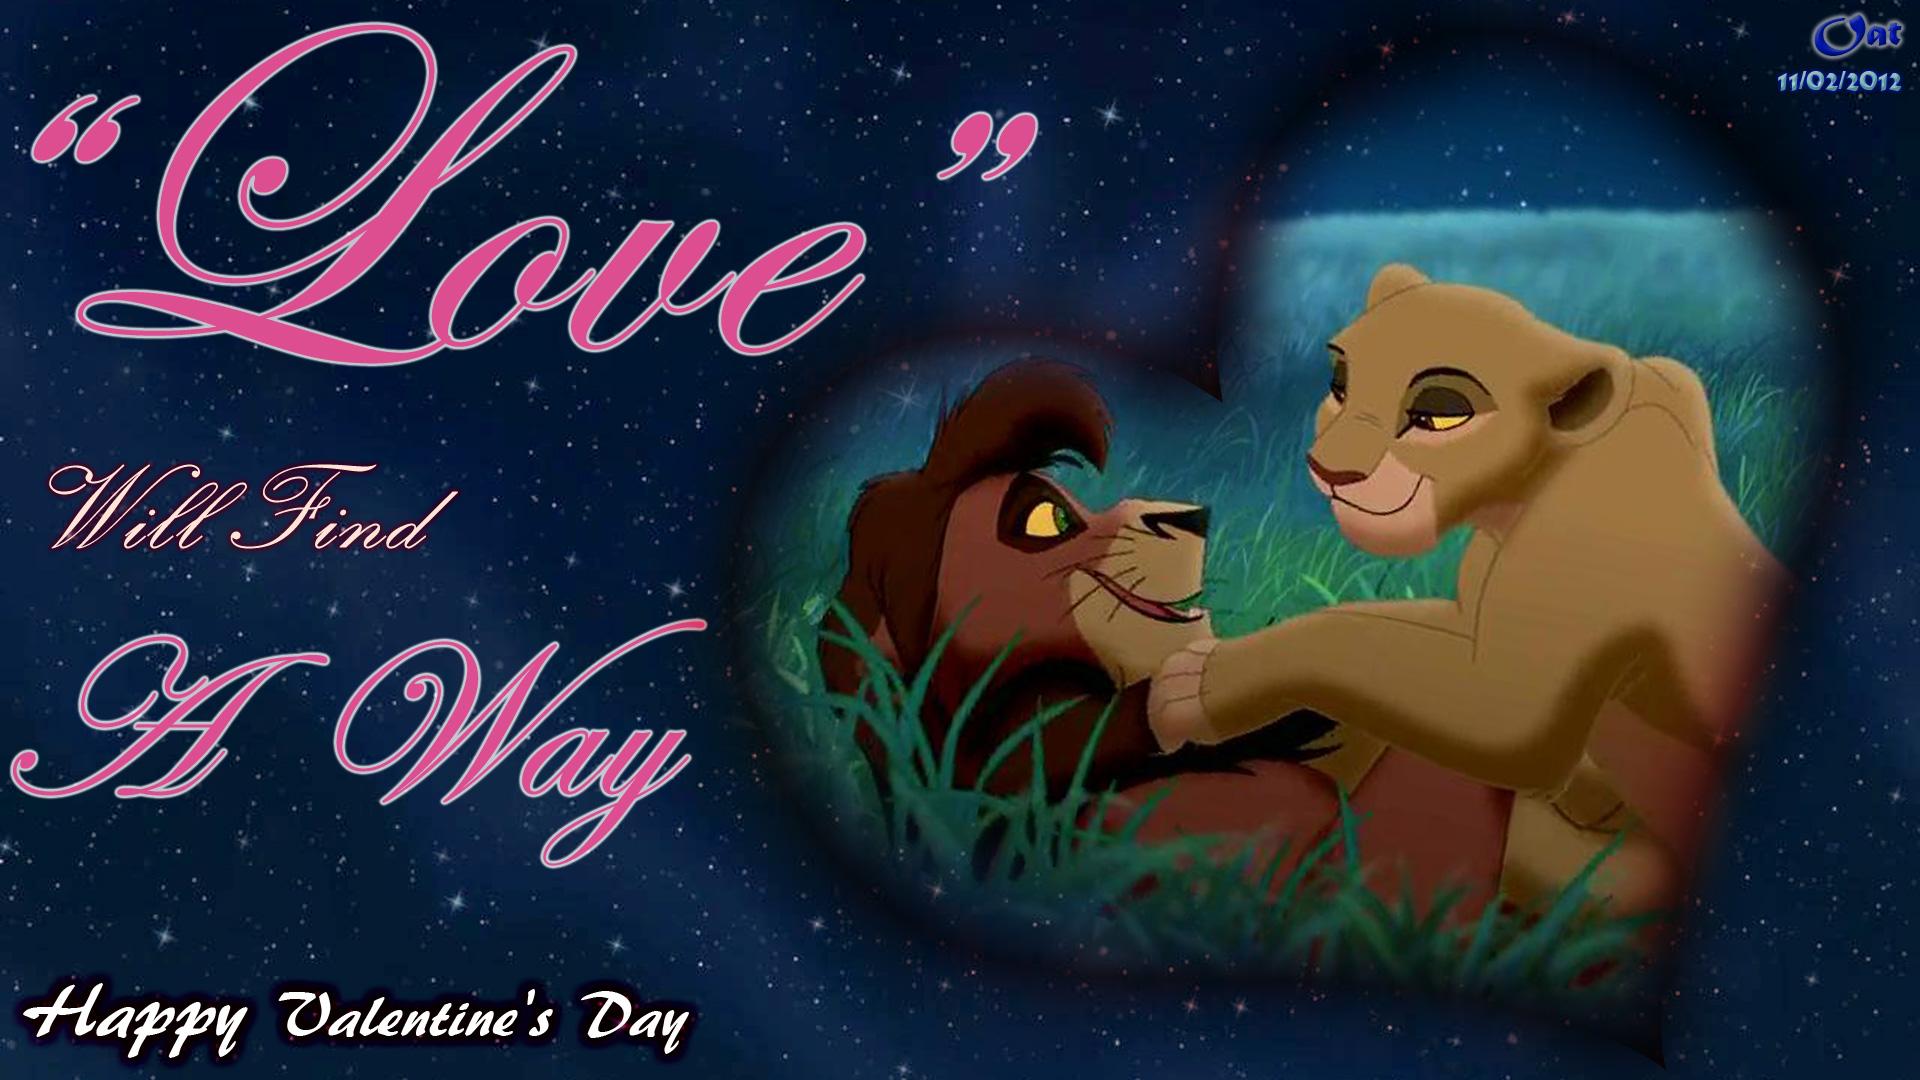 The Lion King 2 Kiara And Kovu Song - Adult Kovu And Kiara Valentine's Day , HD Wallpaper & Backgrounds